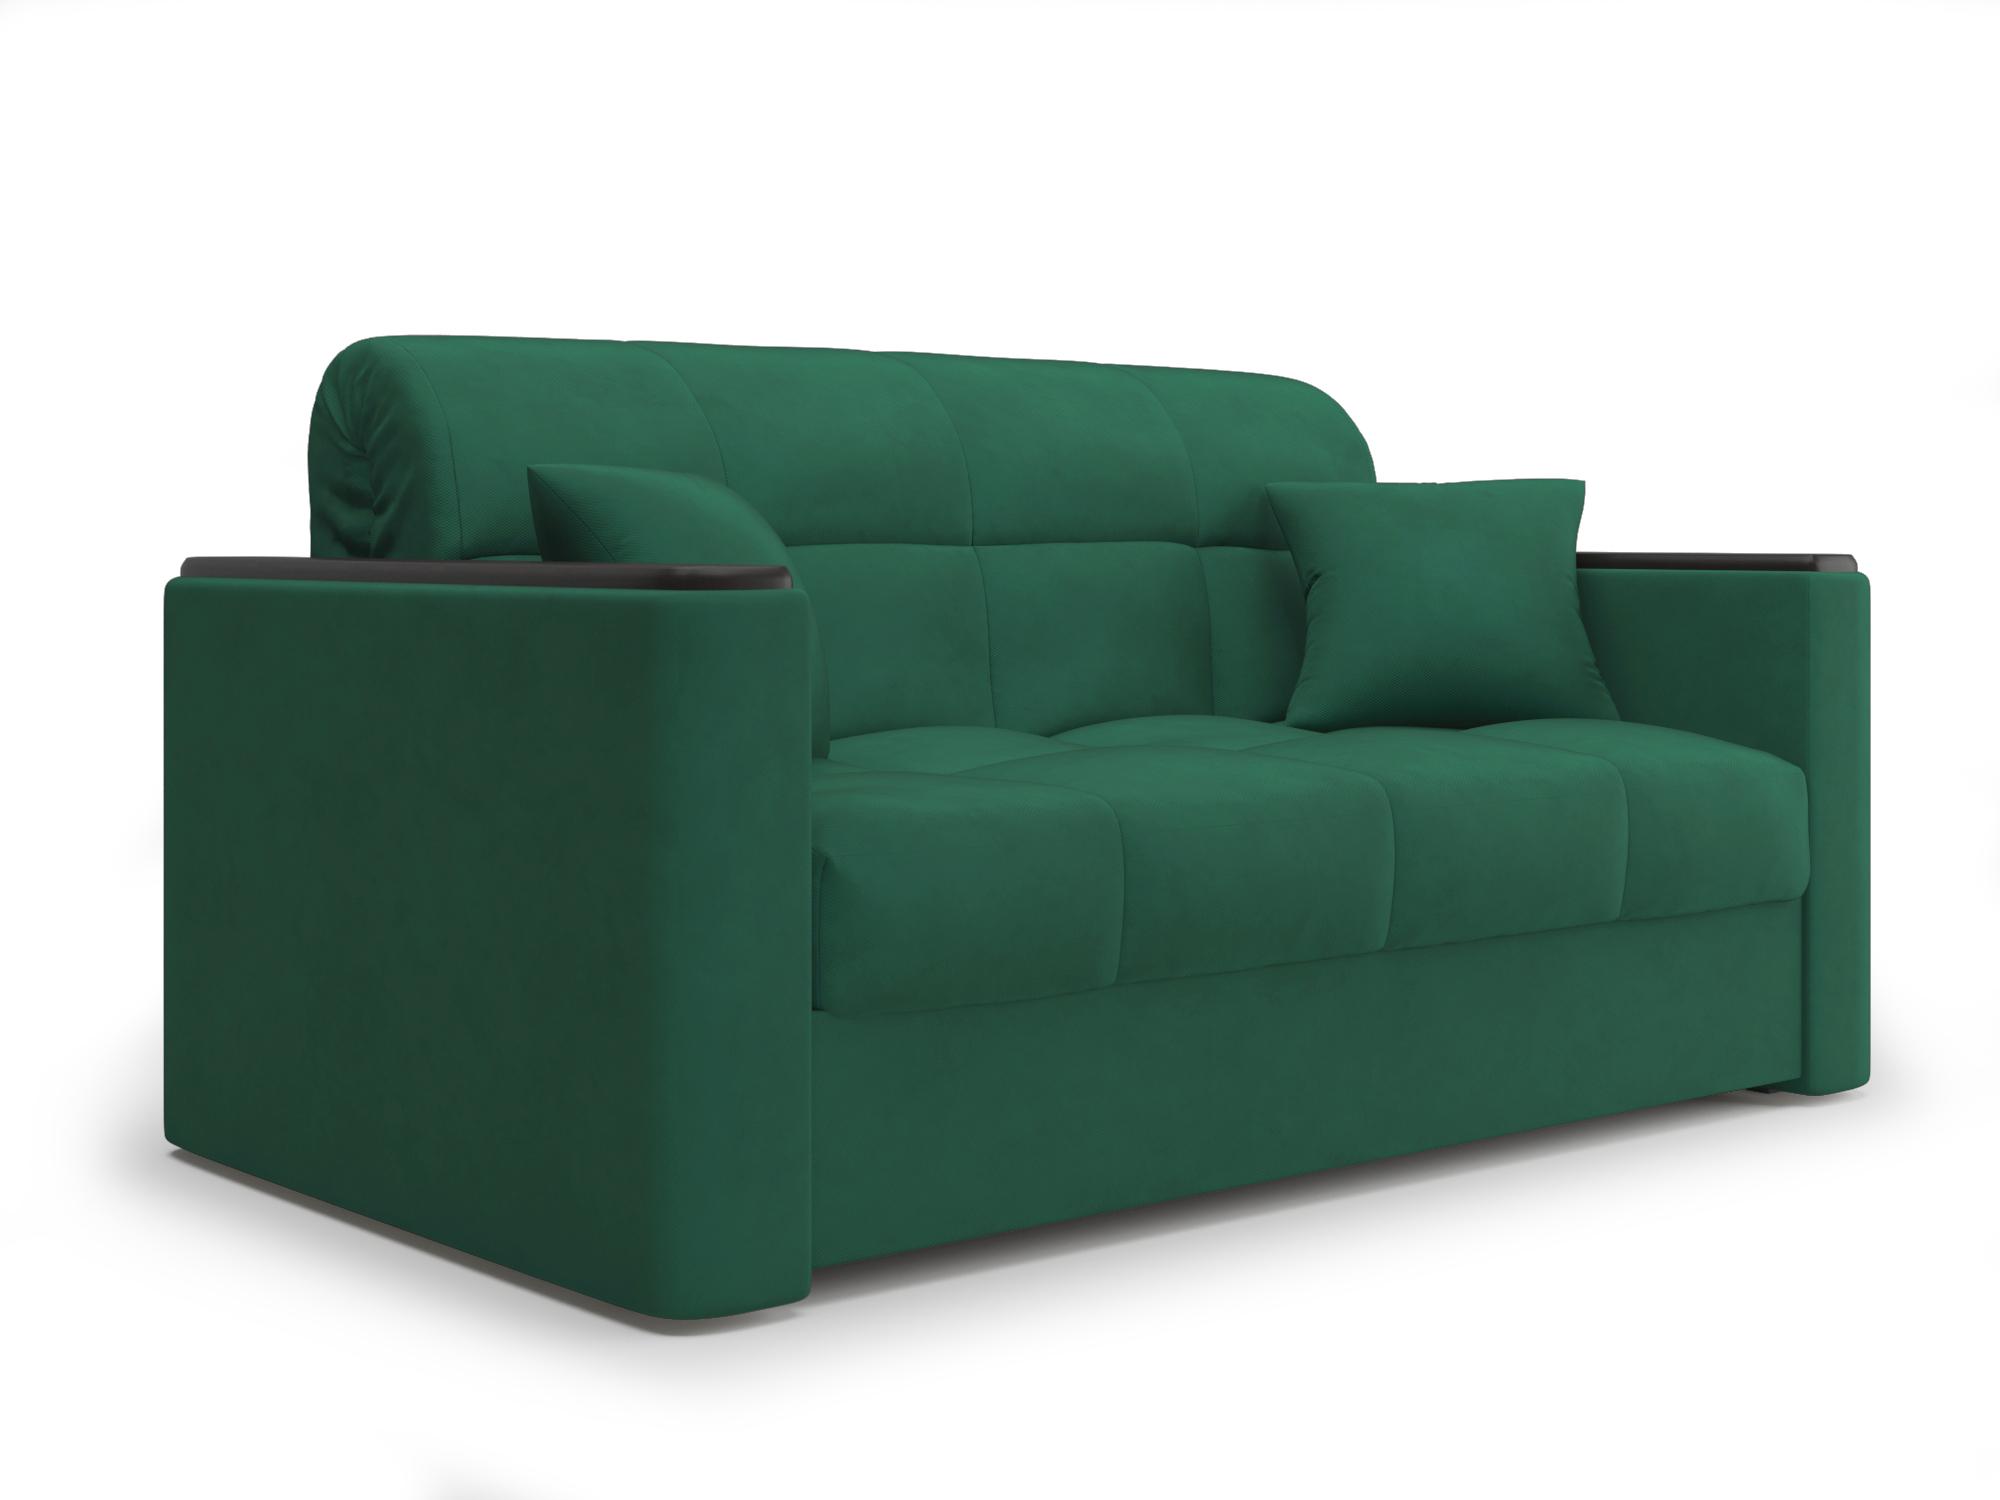 Диван Неаполь Maxx 1,4 MebelVia Зеленый